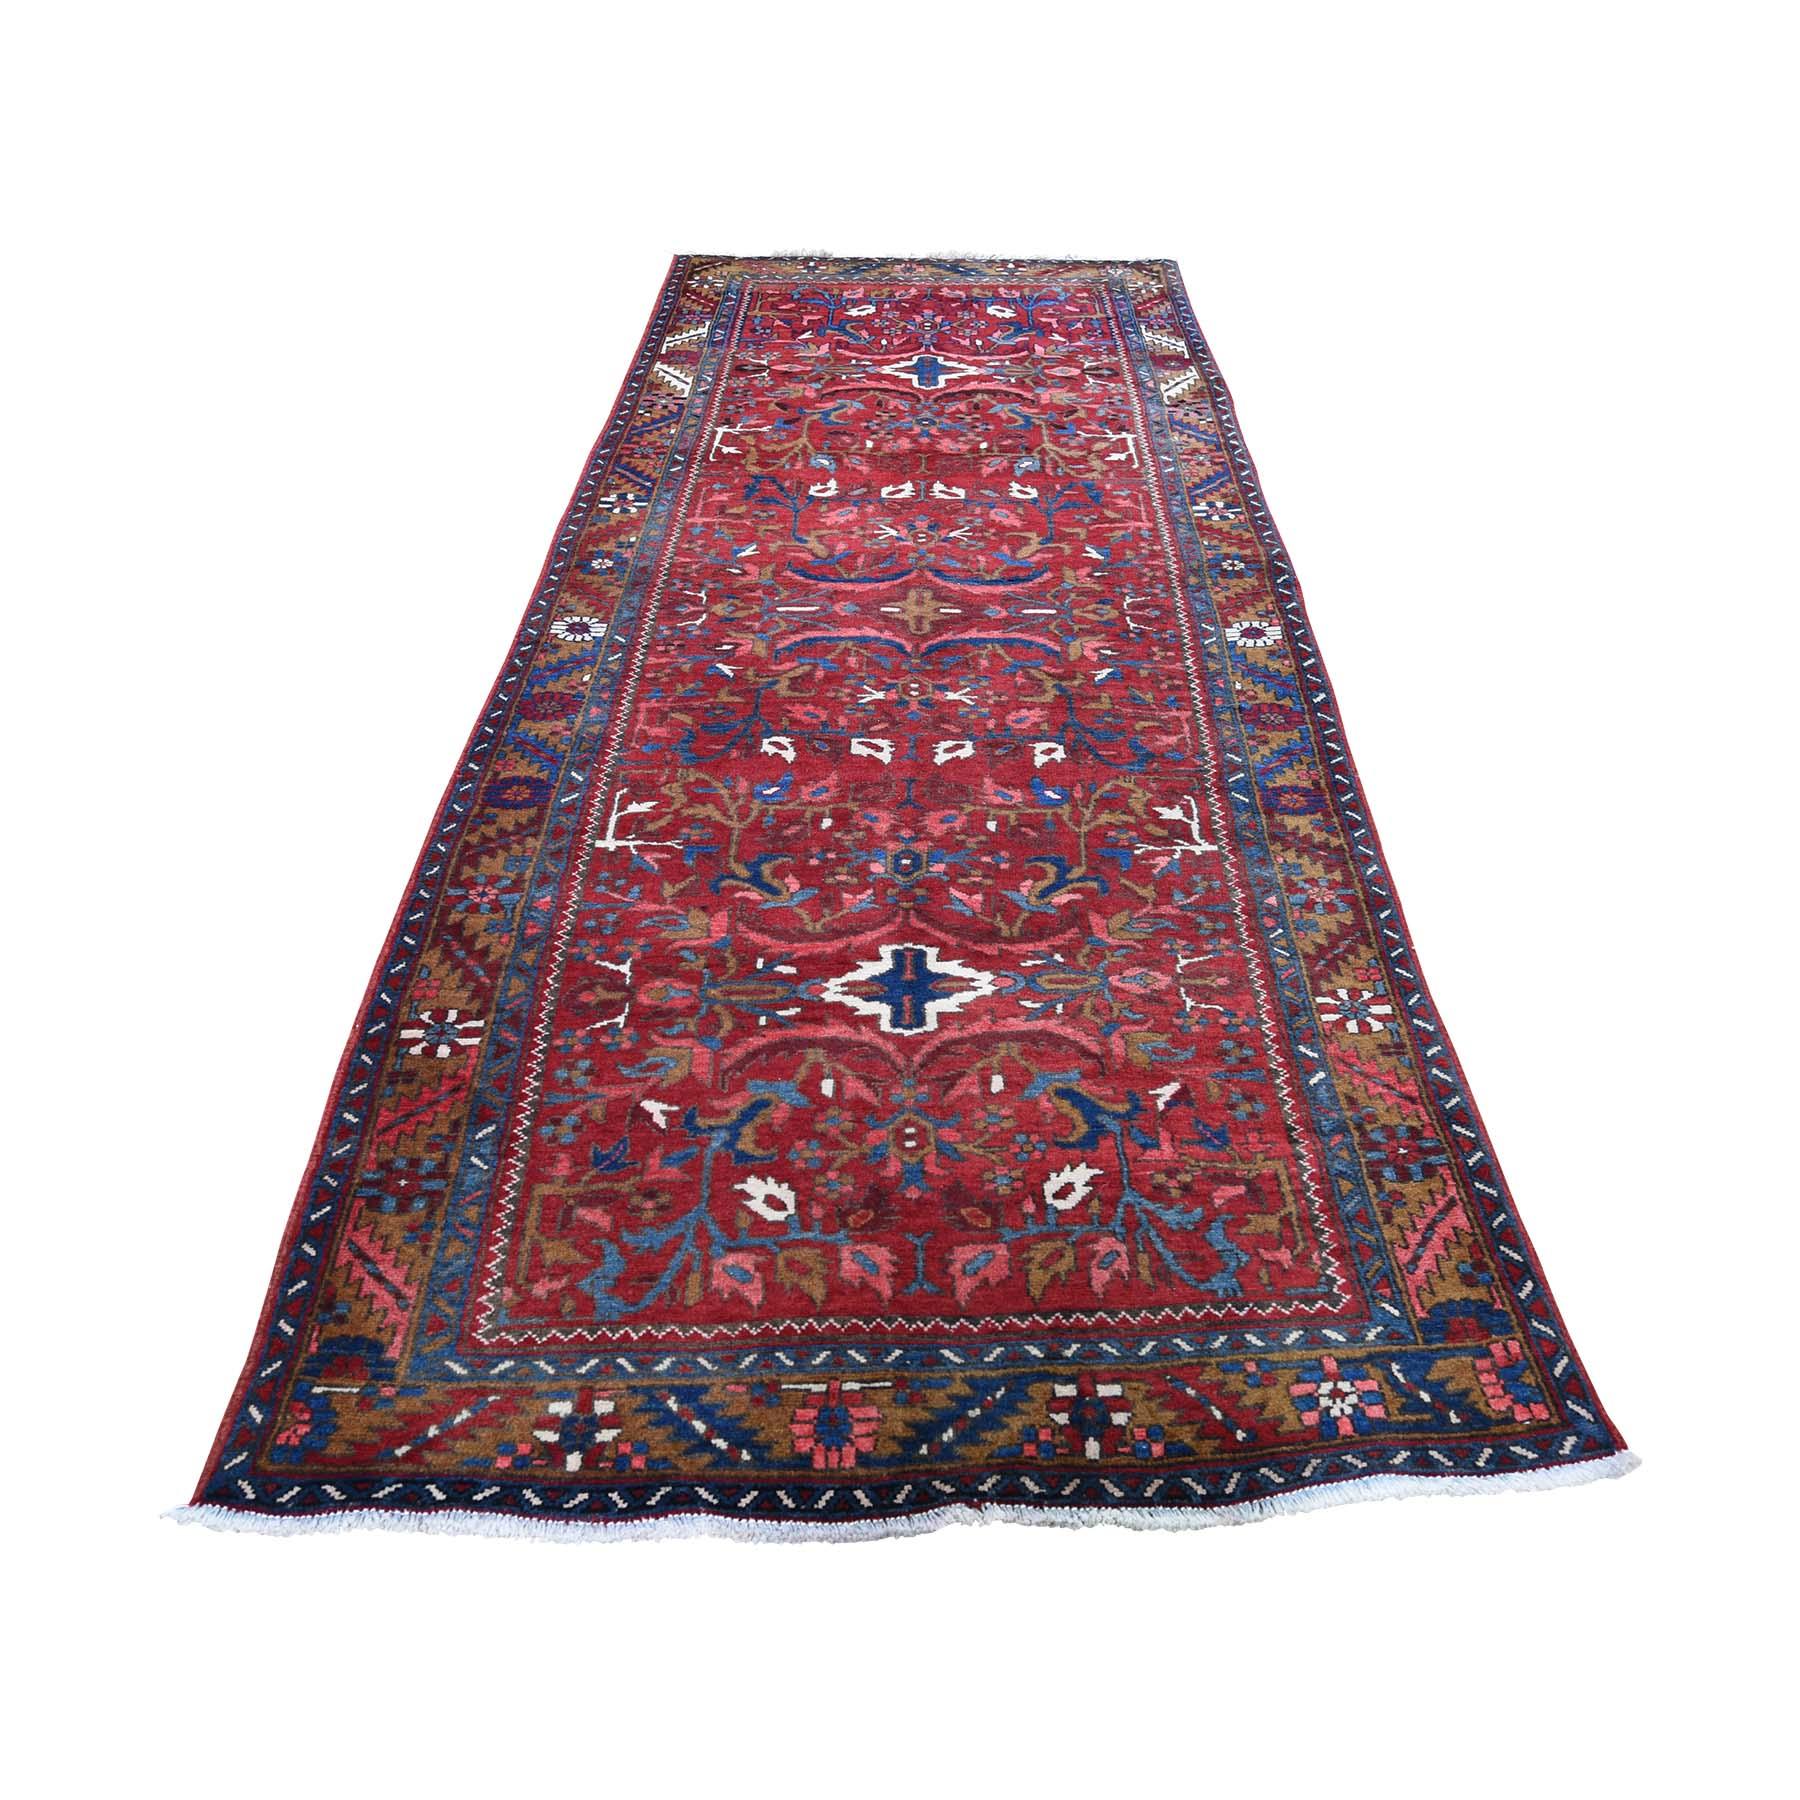 "3'9""x11' Vintage Persian Heriz Hand-Knotted Pure Wool Wide Runner Oriental Rug"